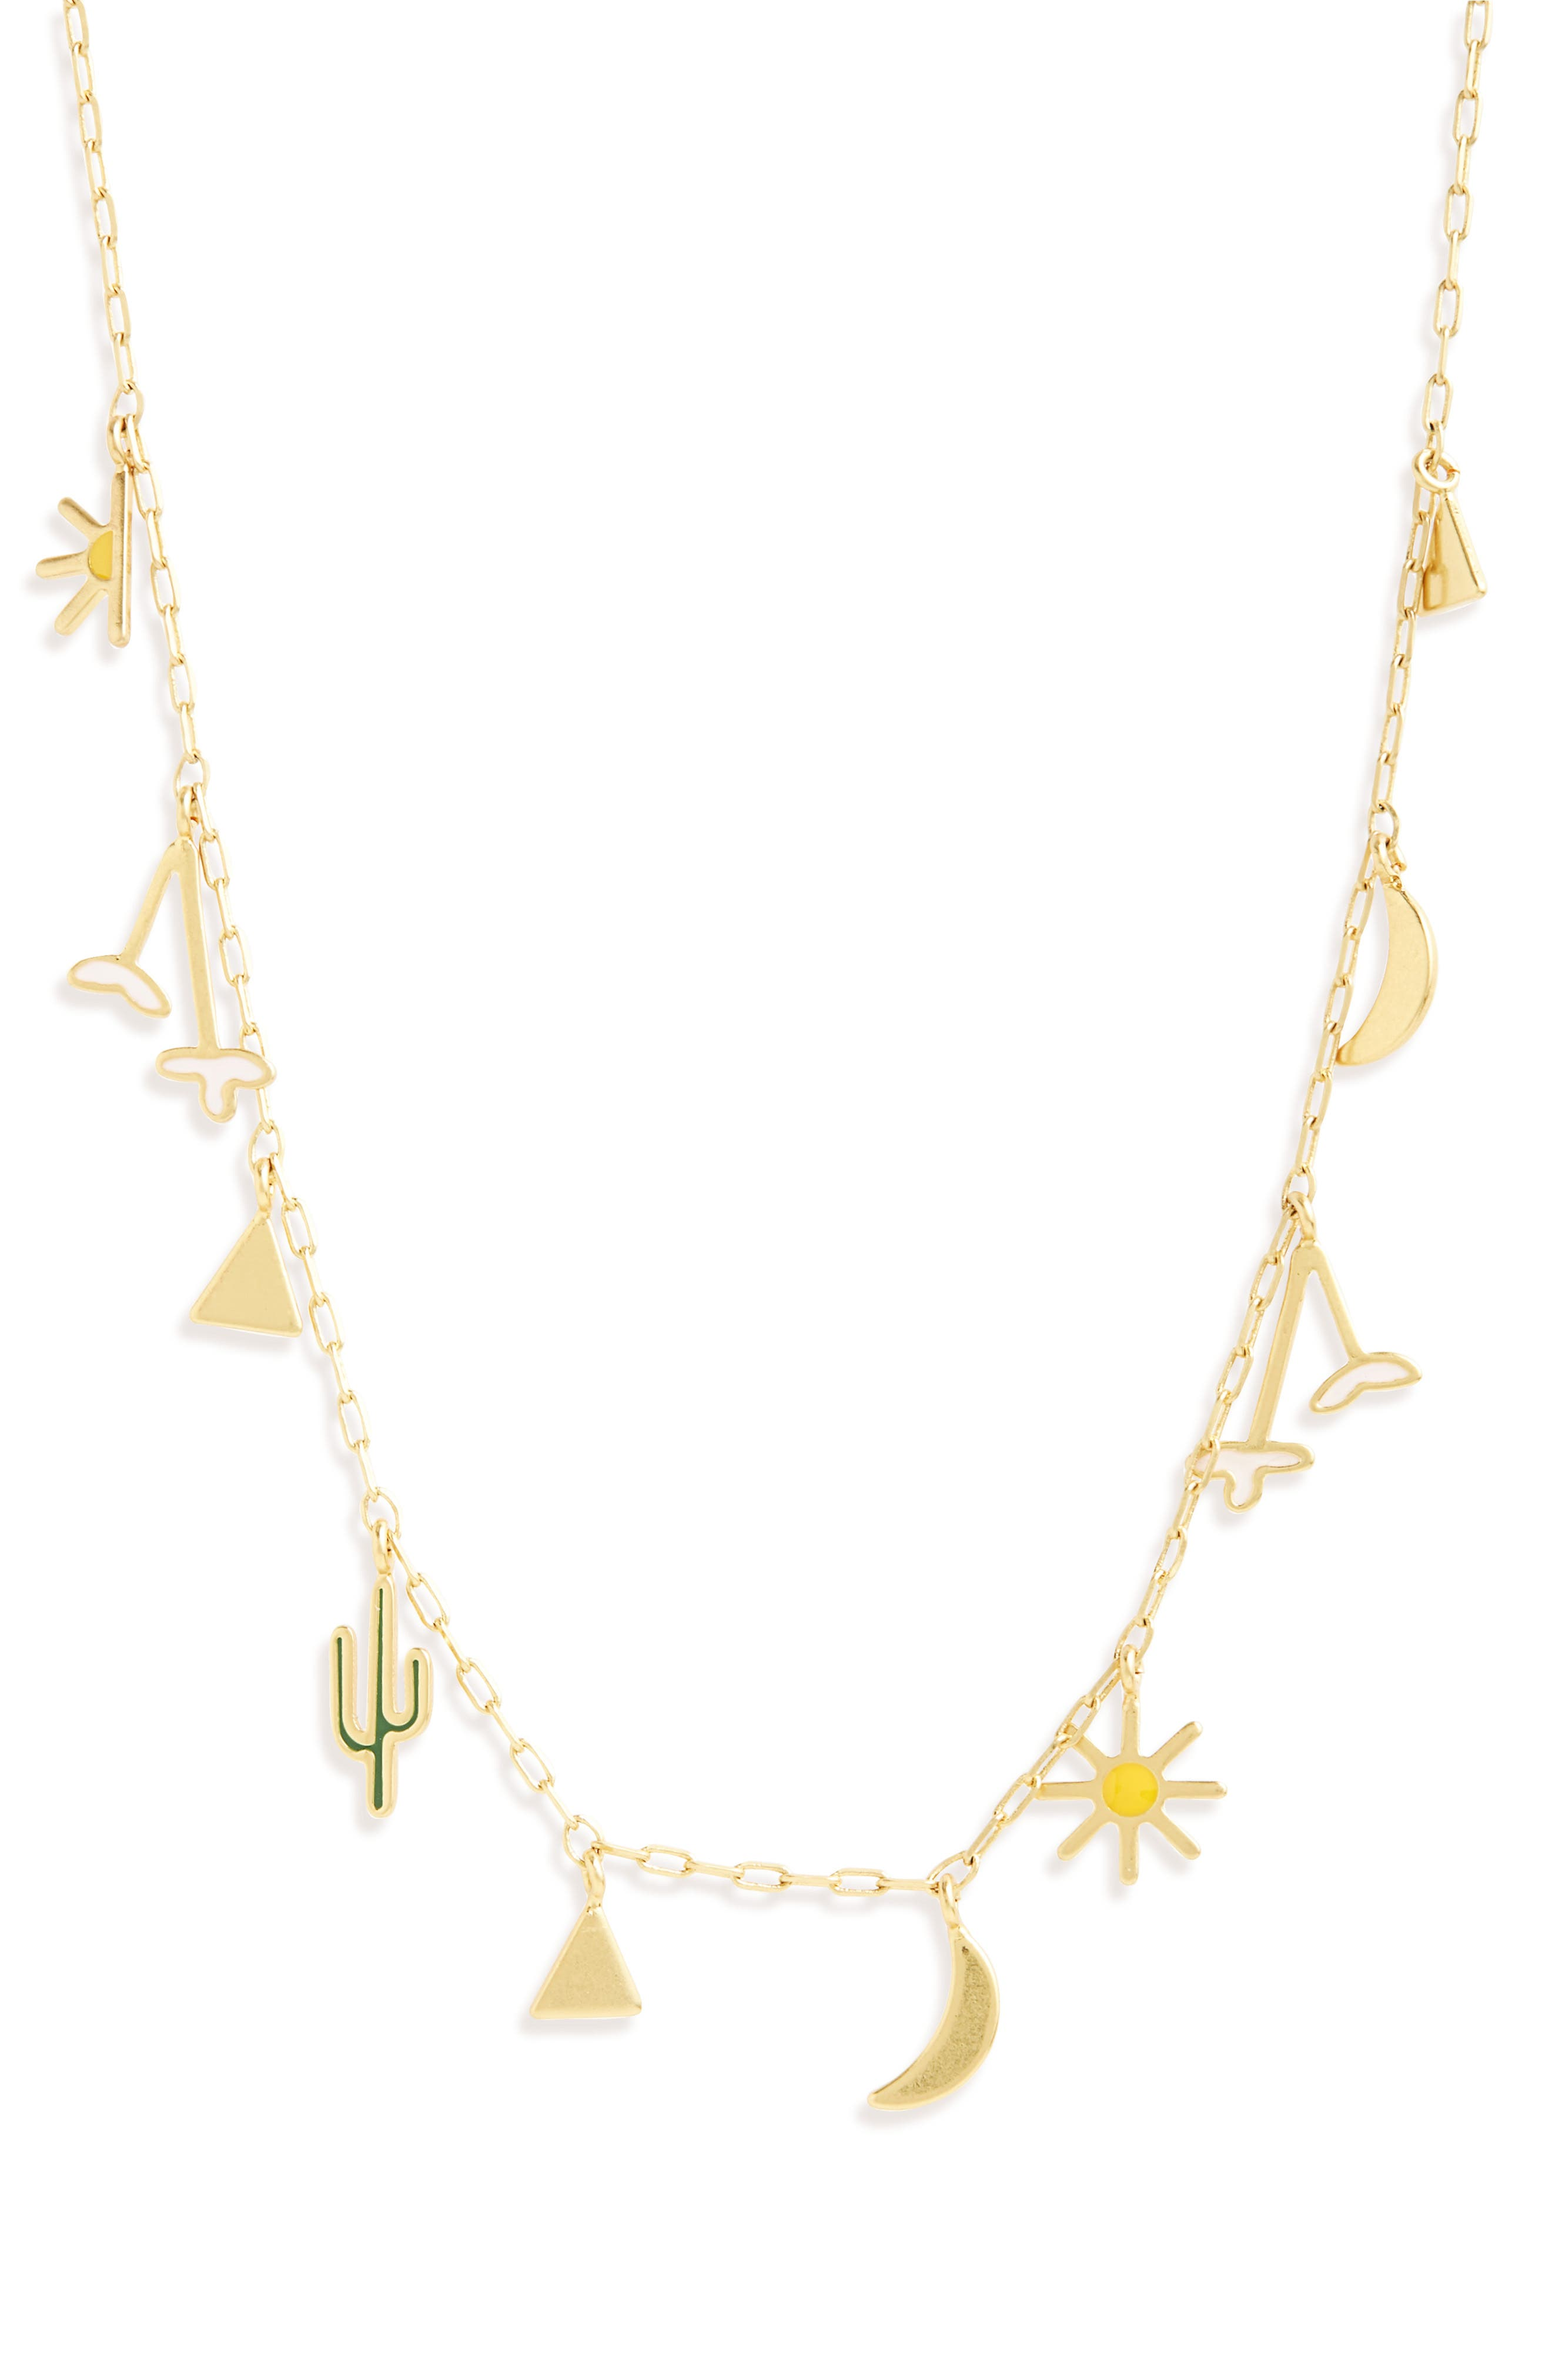 Primal Charm Necklace,                             Main thumbnail 1, color,                             Vintage Gold